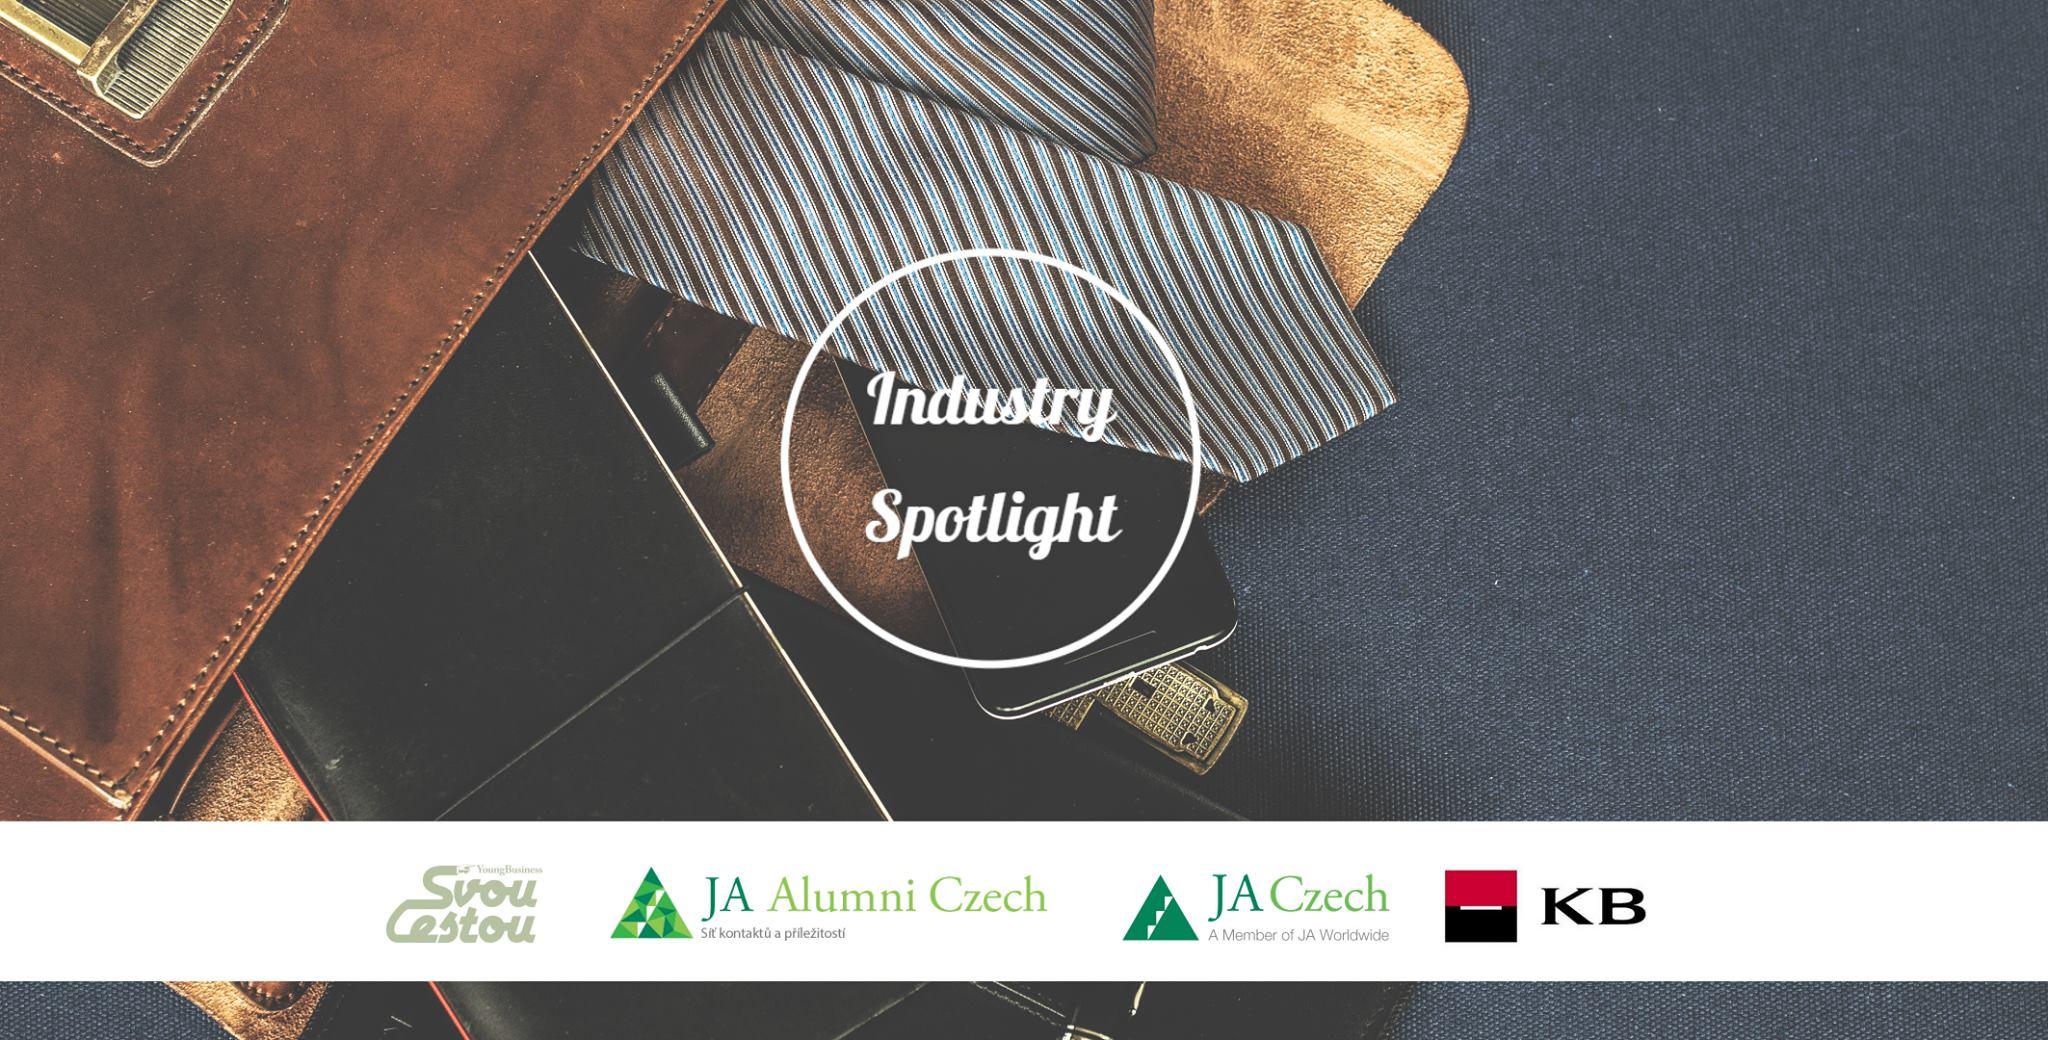 Industry Spotlight - Design and Fashion